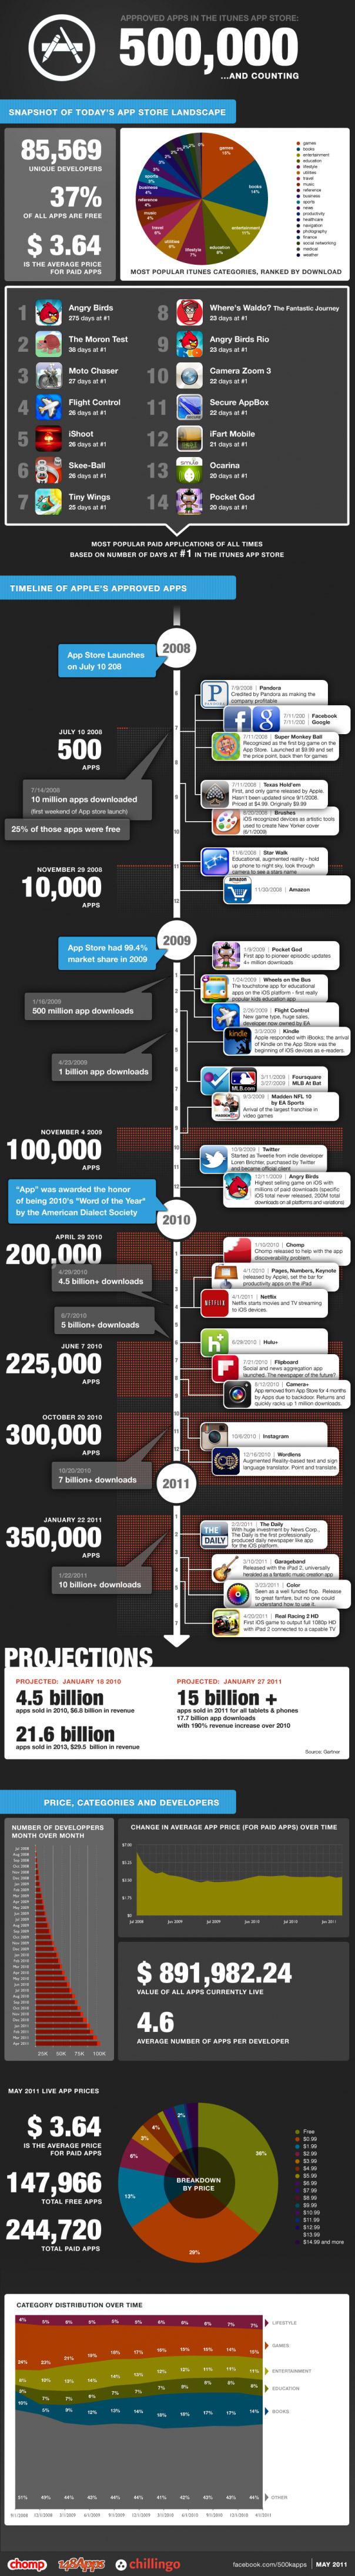 App Store Infographic